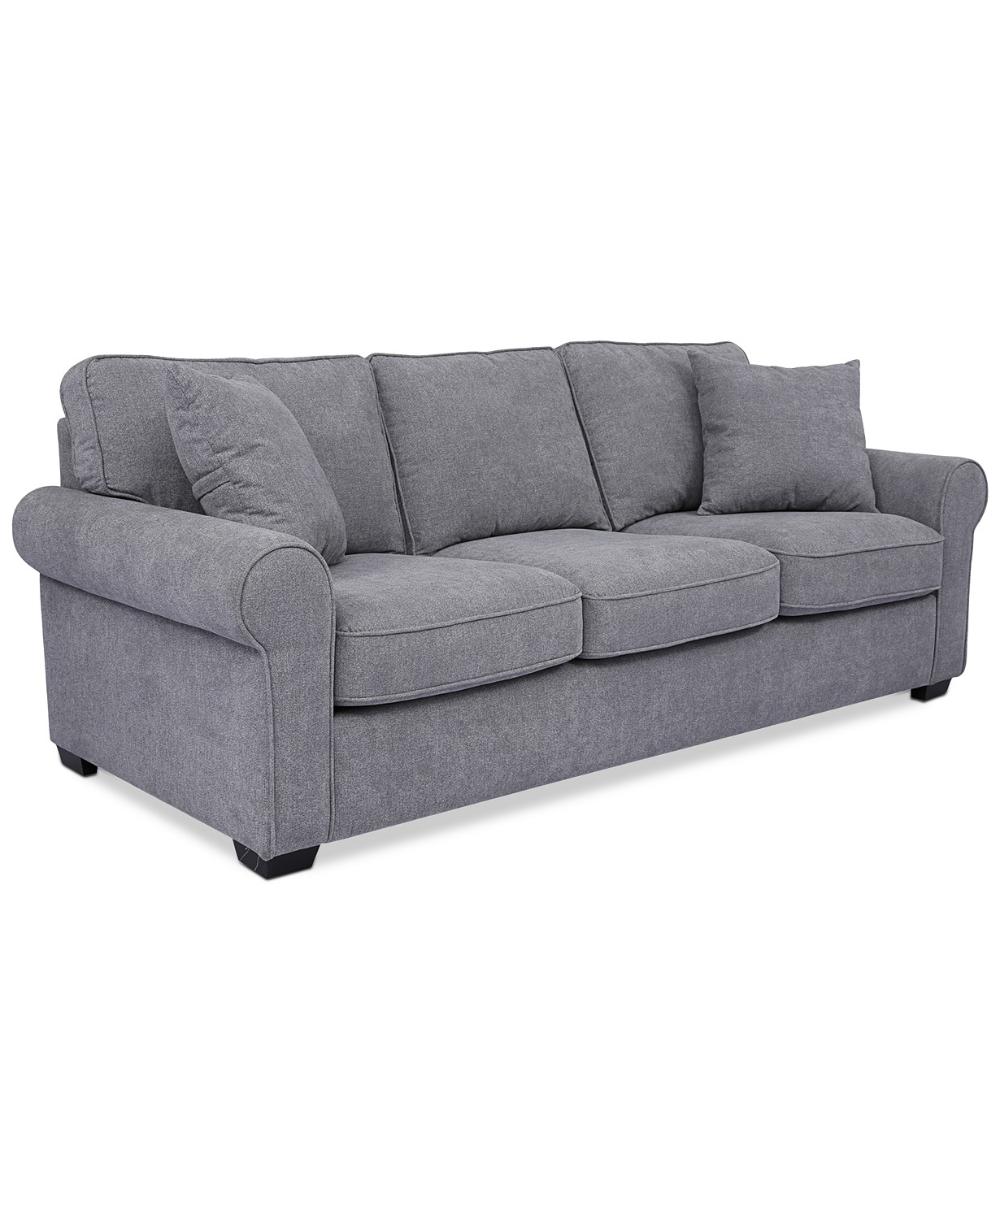 Furniture Ladlow 90 Fabric Sofa Reviews Furniture Macy S In 2020 Fabric Sofa Sofa Furniture